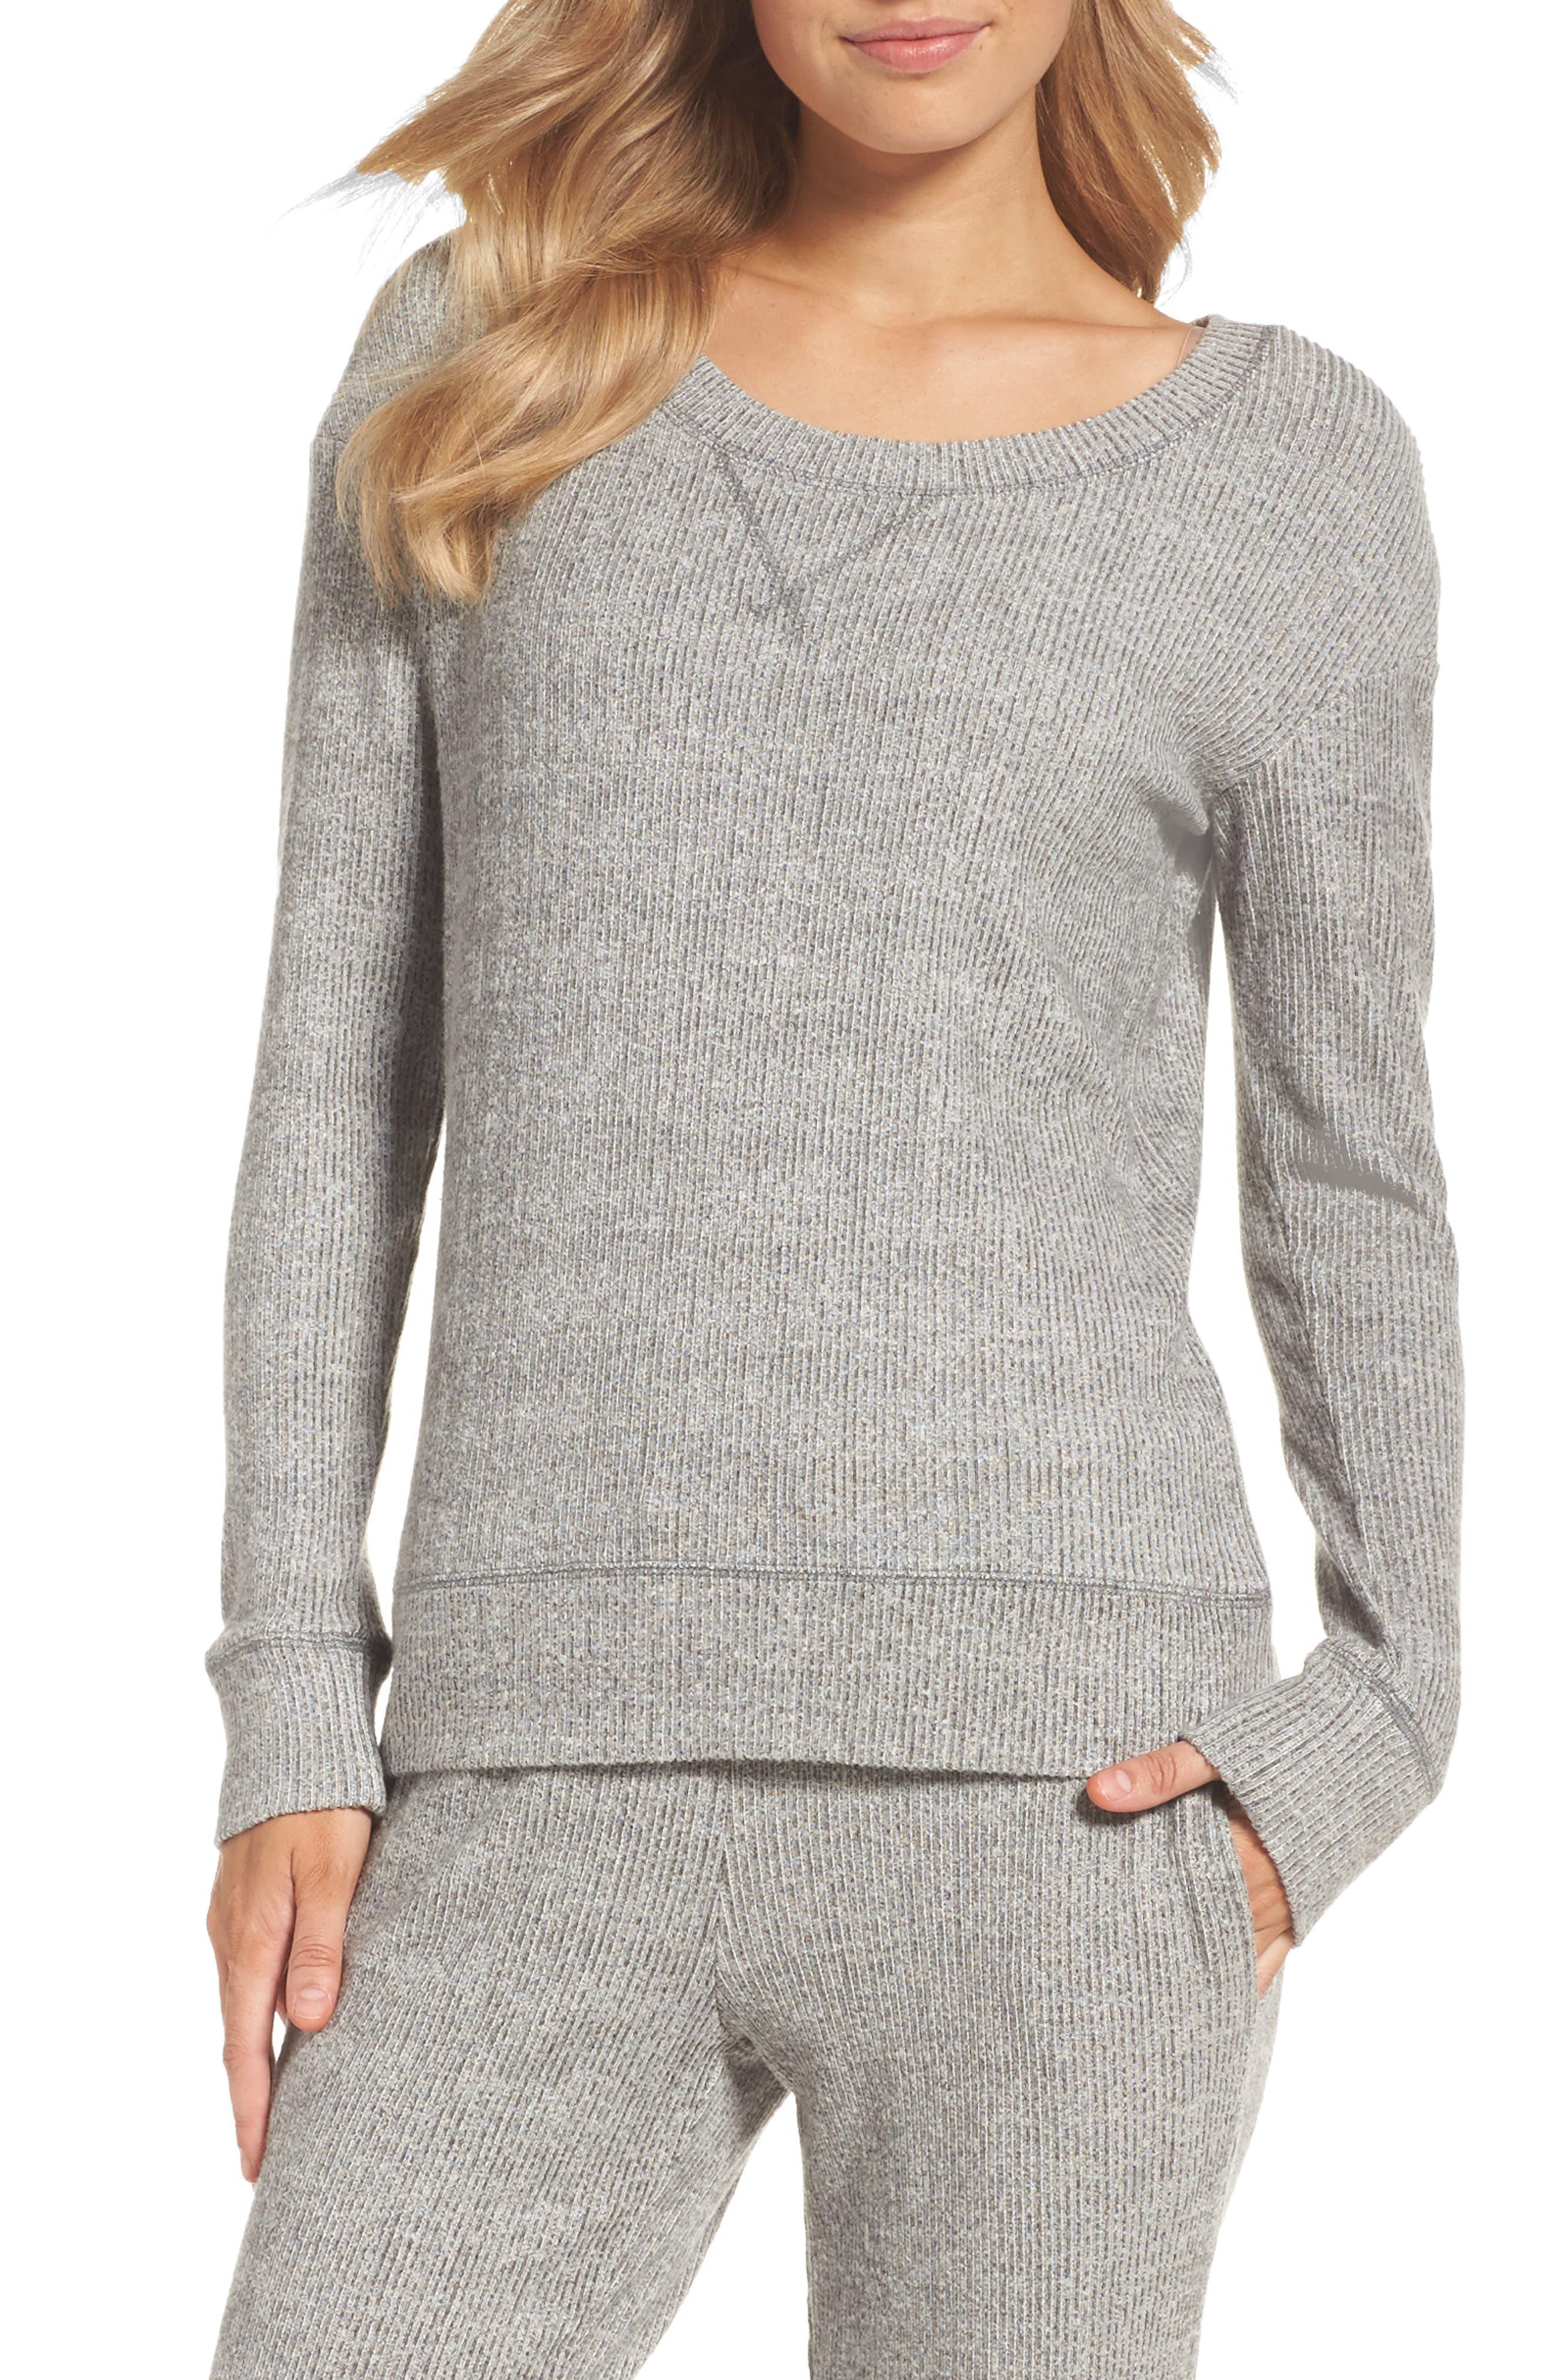 Glenda Sweatshirt,                         Main,                         color, 020